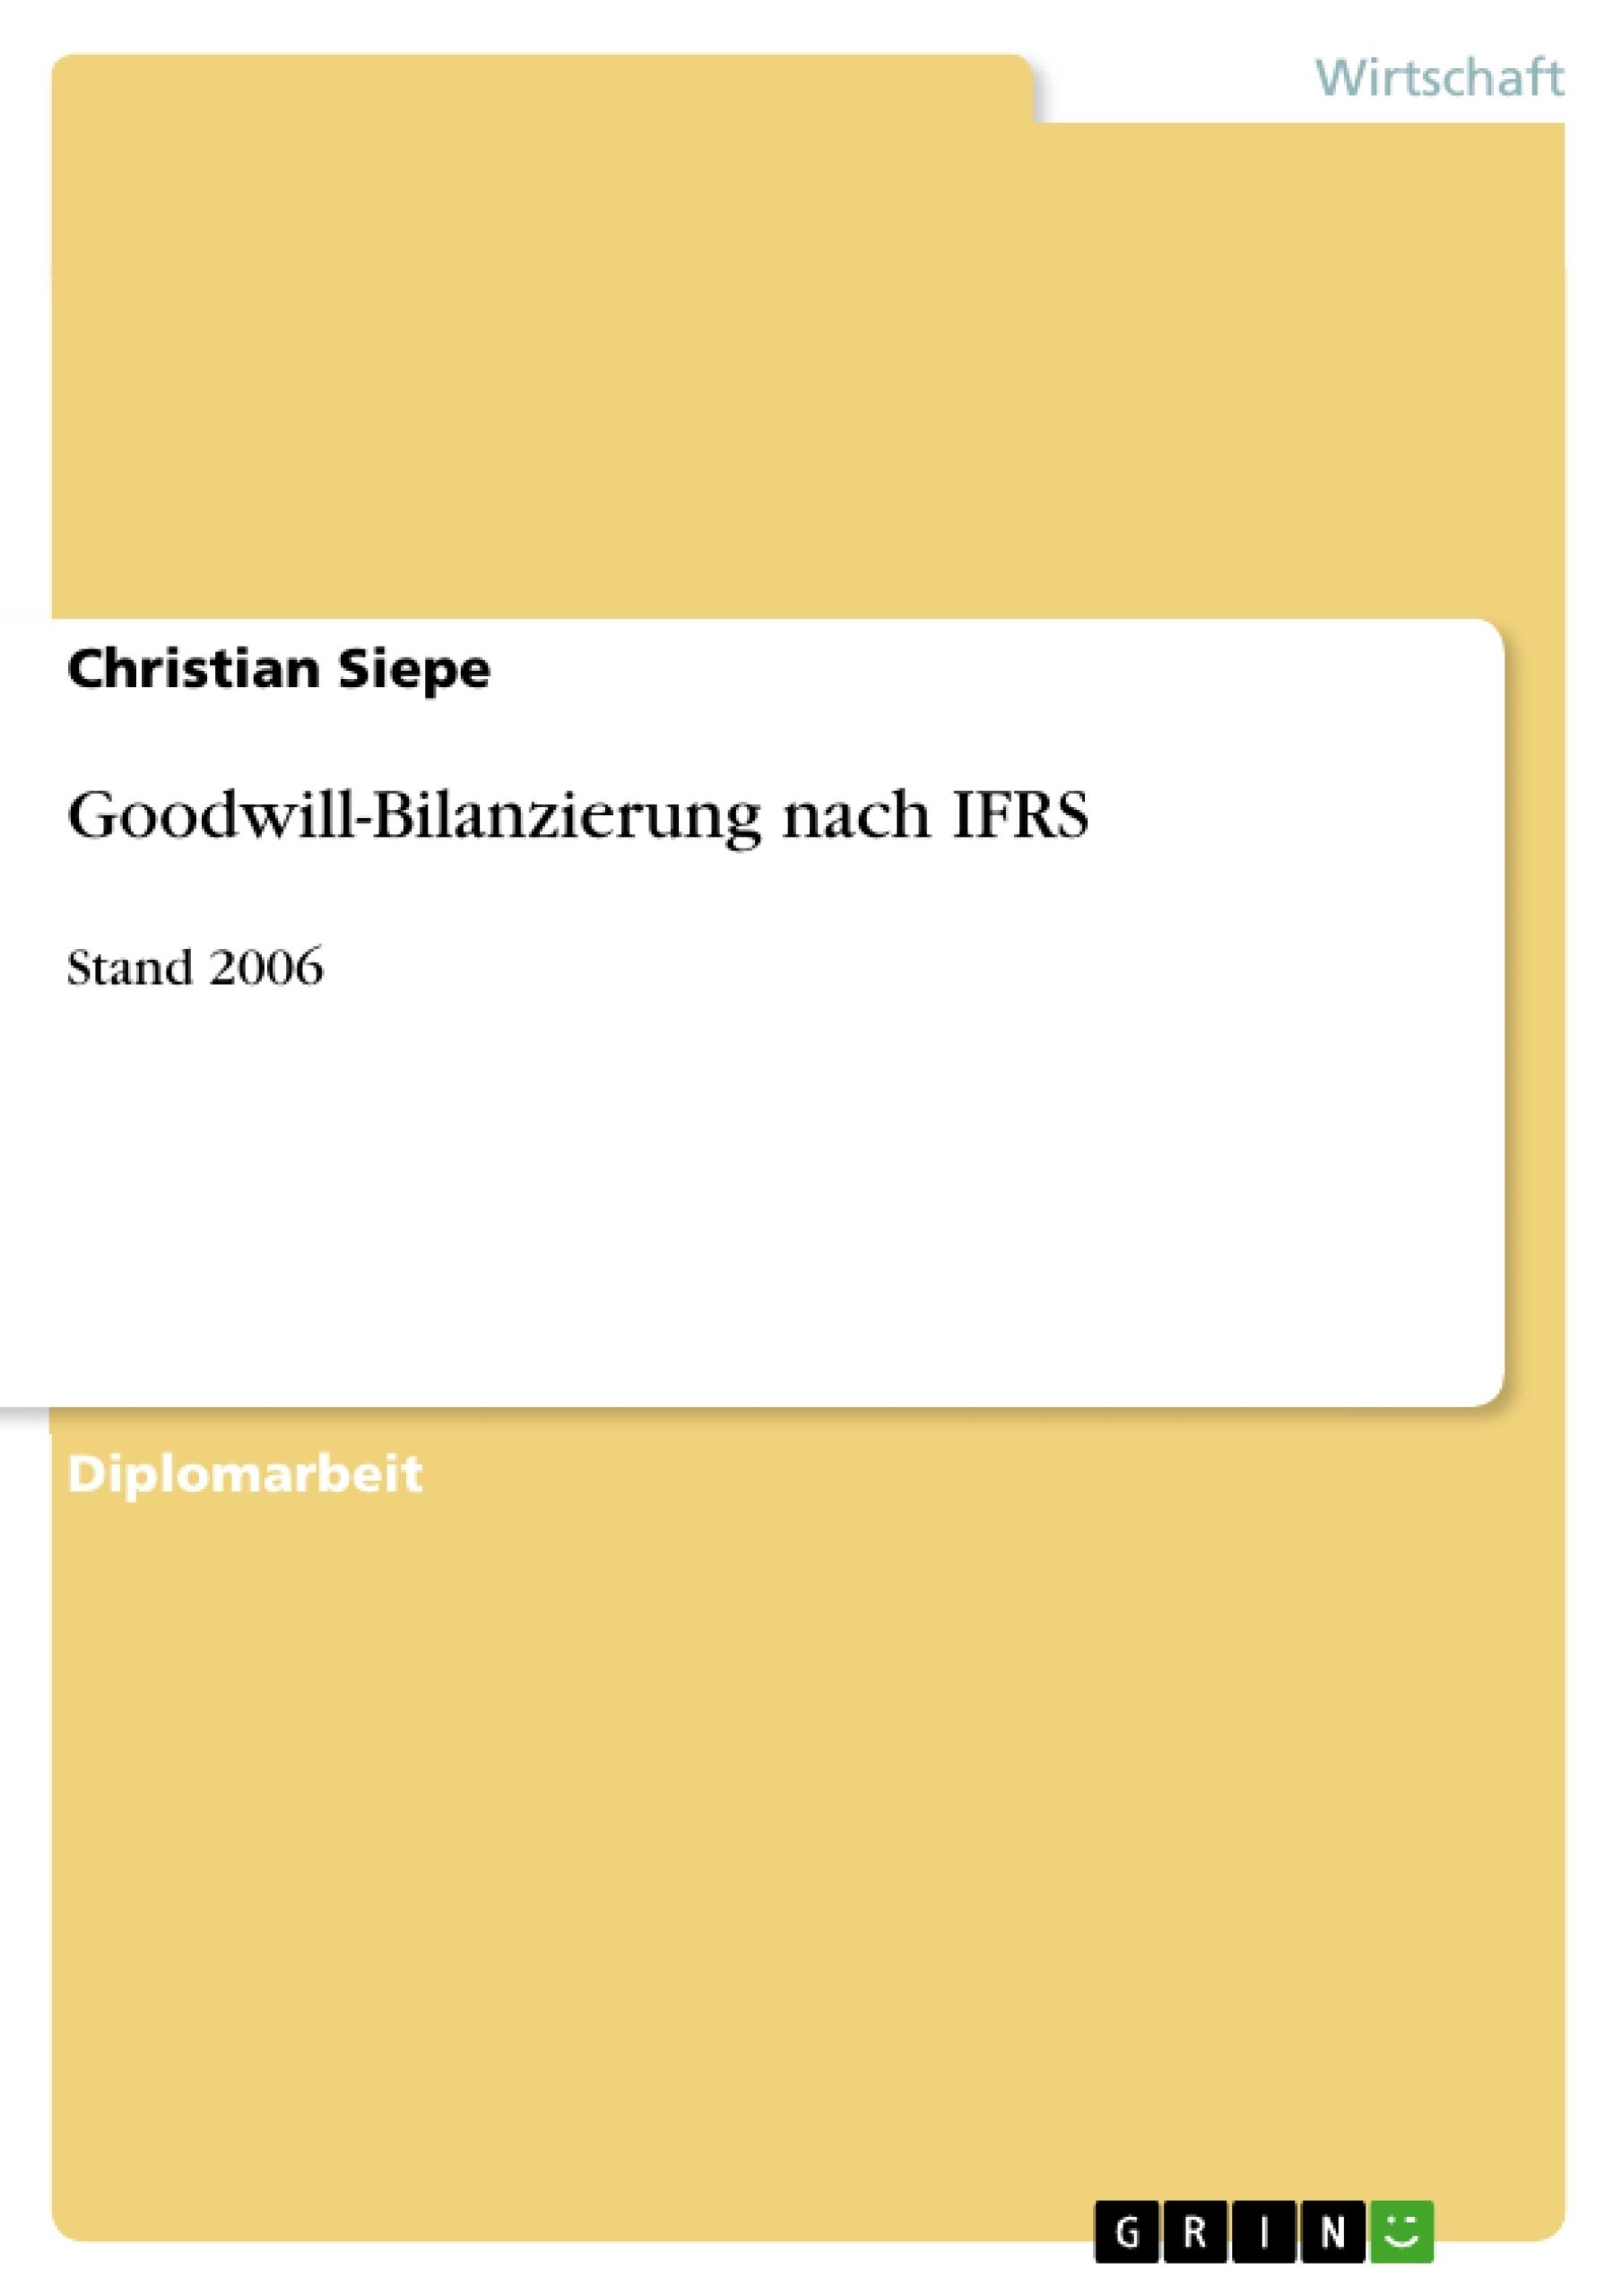 Titel: Goodwill-Bilanzierung nach IFRS